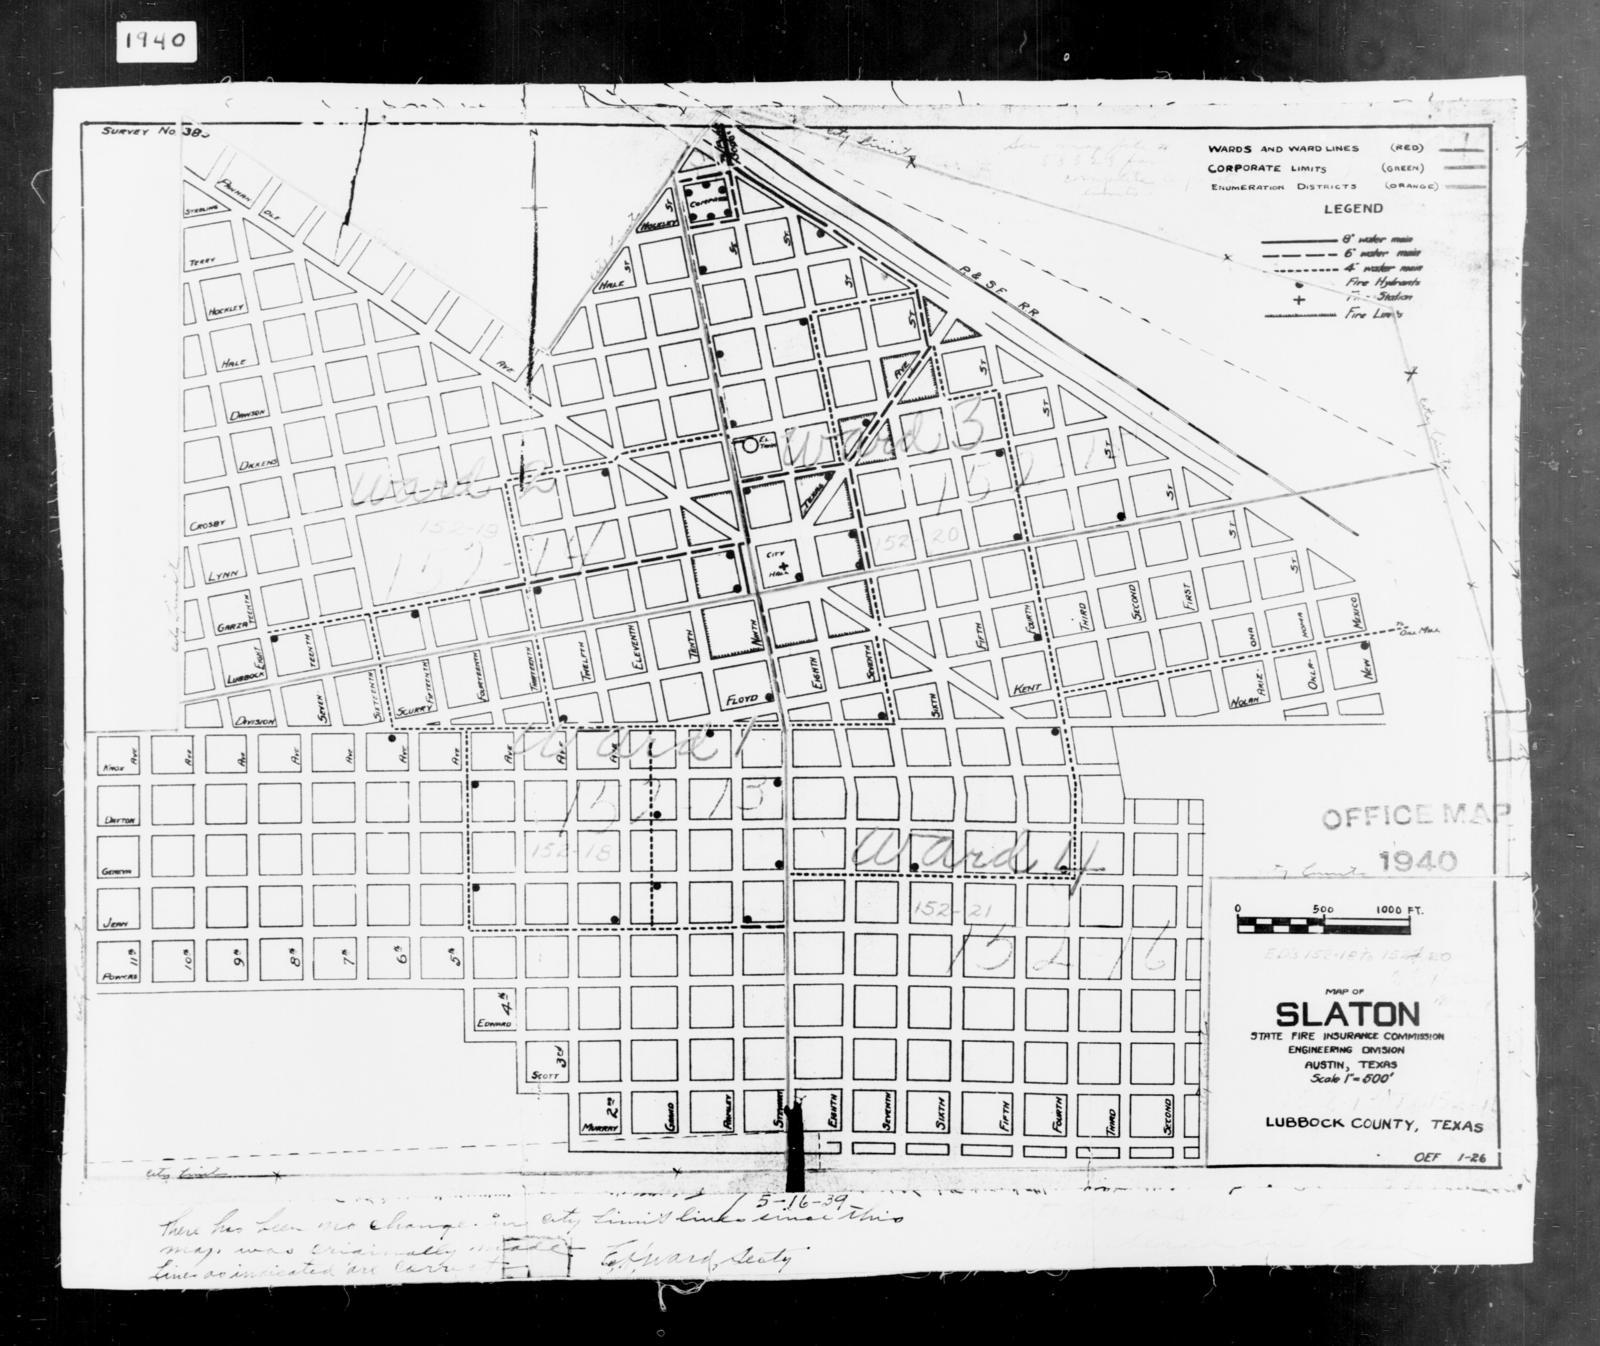 1940 Census Enumeration District Maps - Texas - Lubbock ... on map of alpine texas, map of taylor texas, map of brownfield texas, map of laredo texas, map of tarpley texas, map of amherst texas, map of mcallen texas, map of lubbock texas, map of harlingen texas, map of o'donnell texas, map of stafford texas, map of greatwood texas, map of rockwall texas, map of uhland texas, map of longview texas, map of stockdale texas, map of weimar texas, map of sundown texas, map of sachse texas, map of sinton texas,